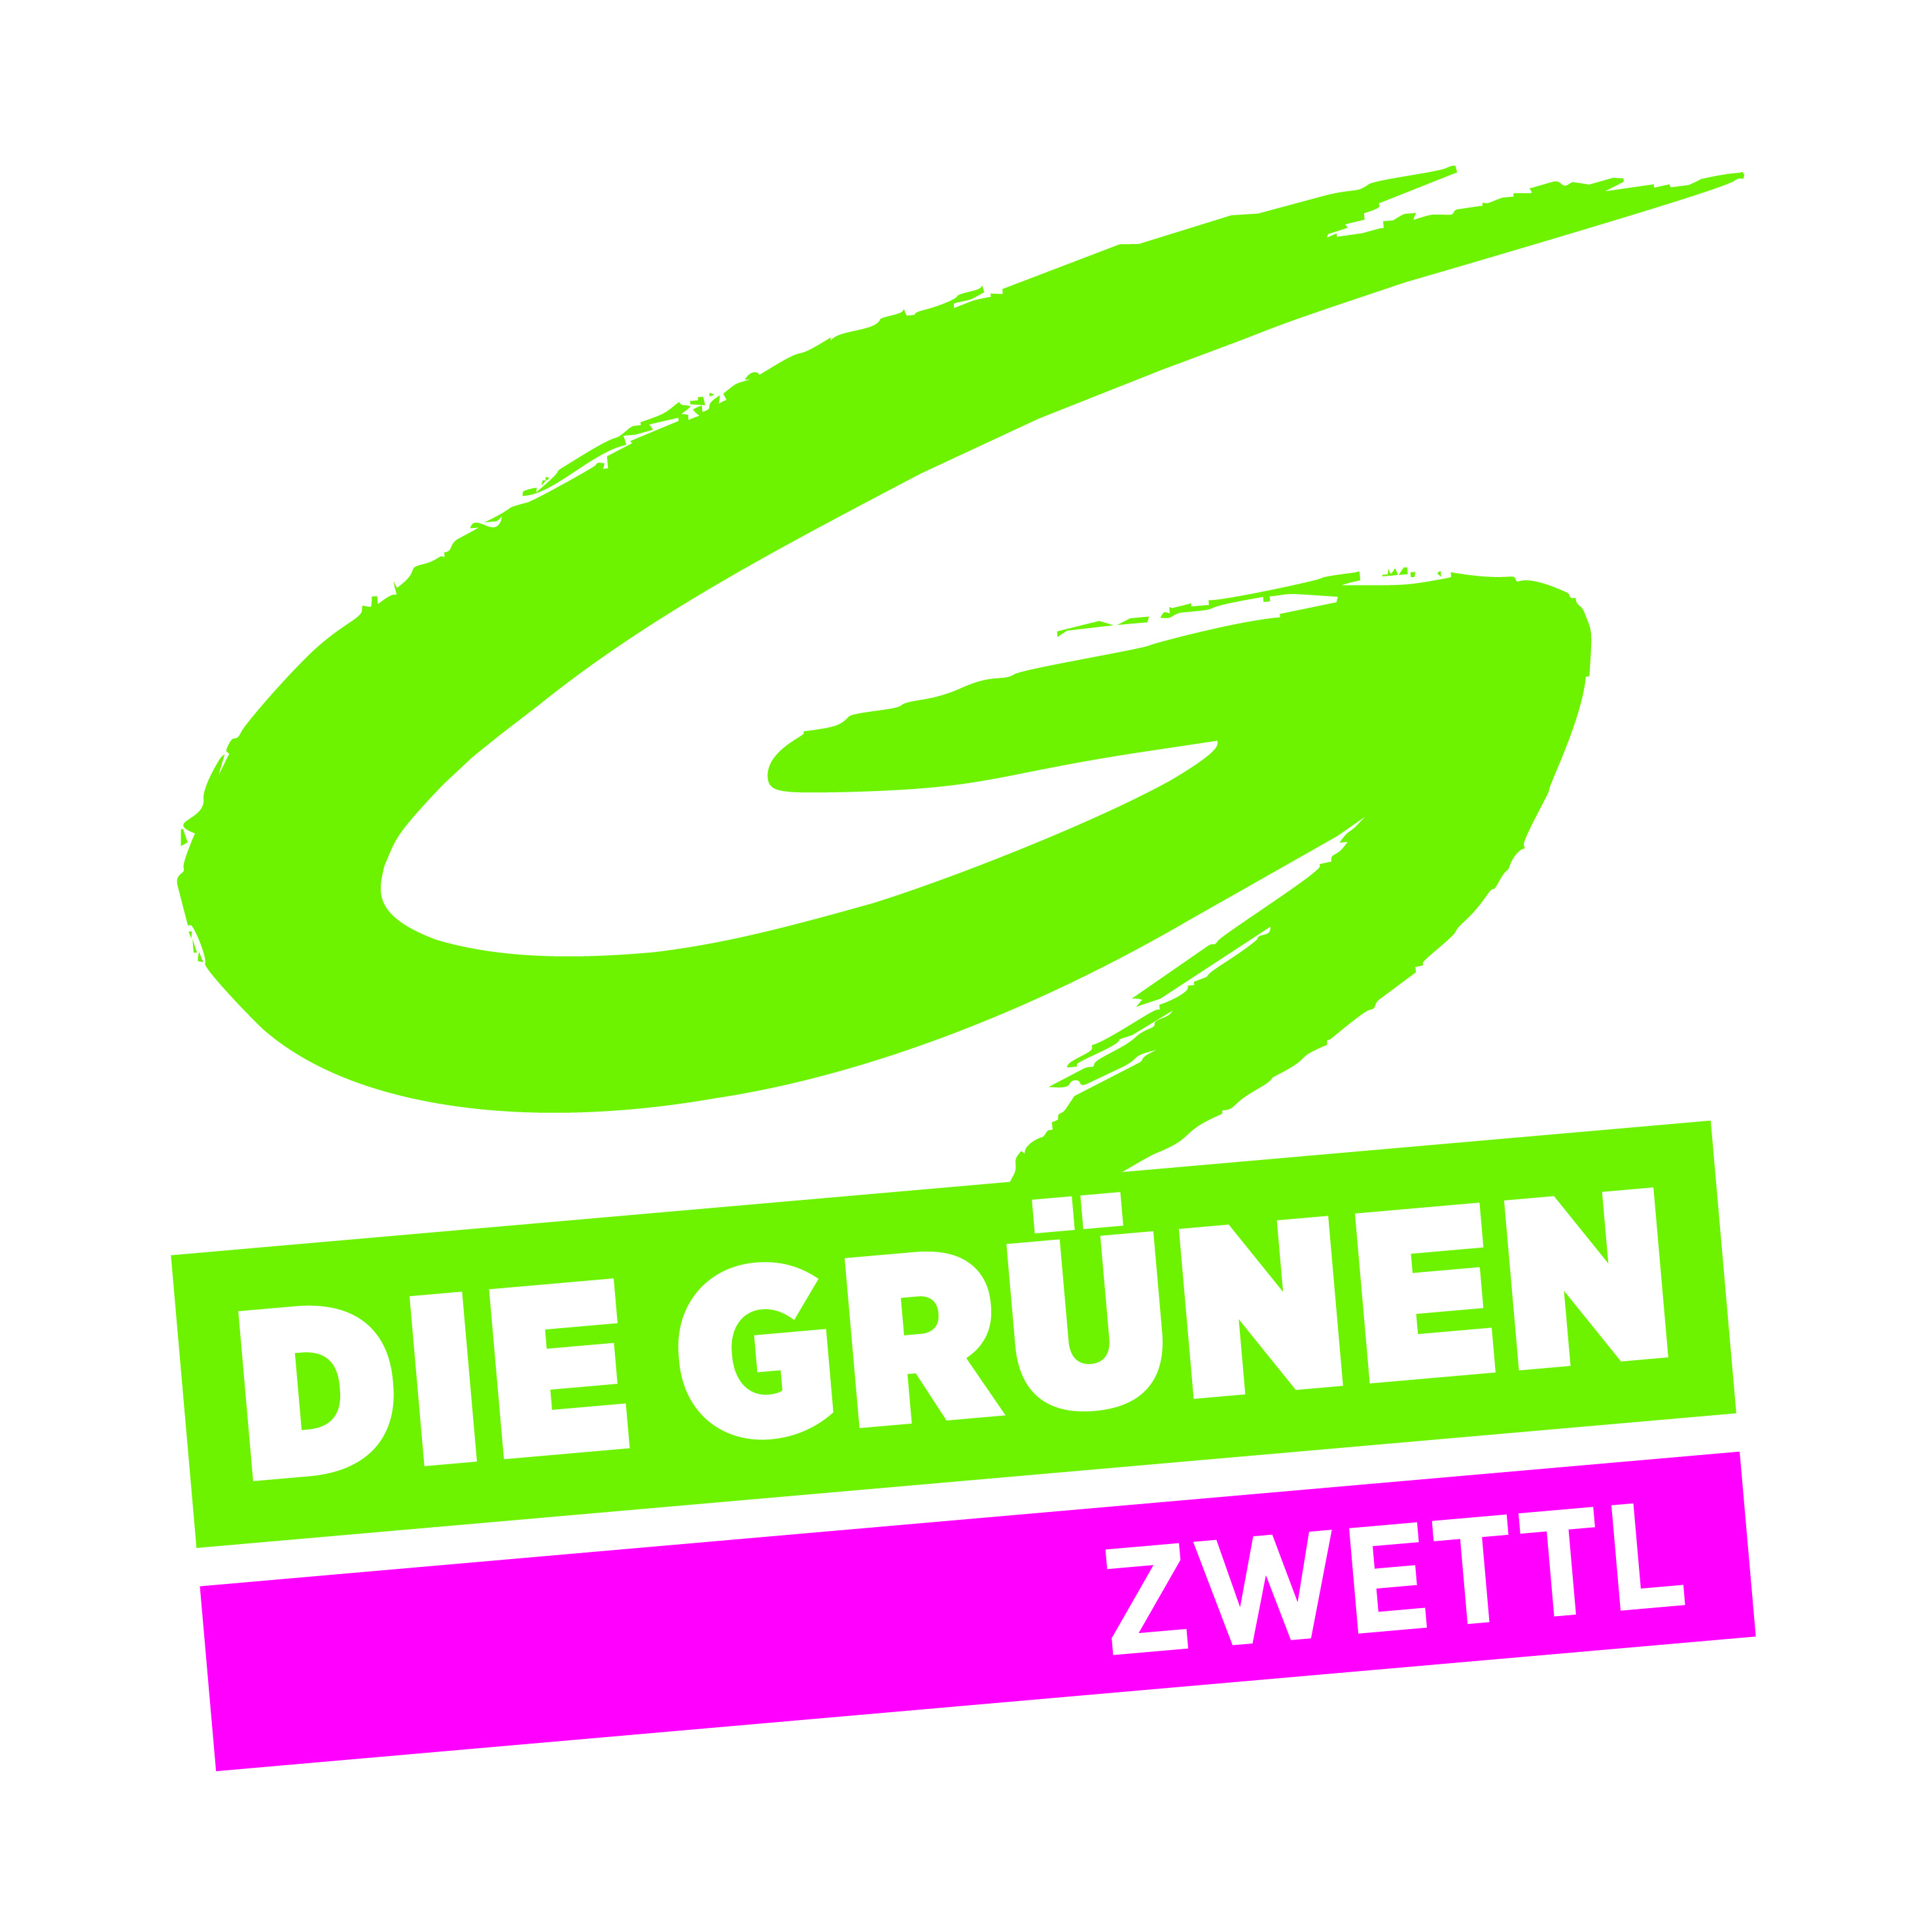 Online Chat & Dating Zwettl | Lerne Mnner & Frauen in Zwettl